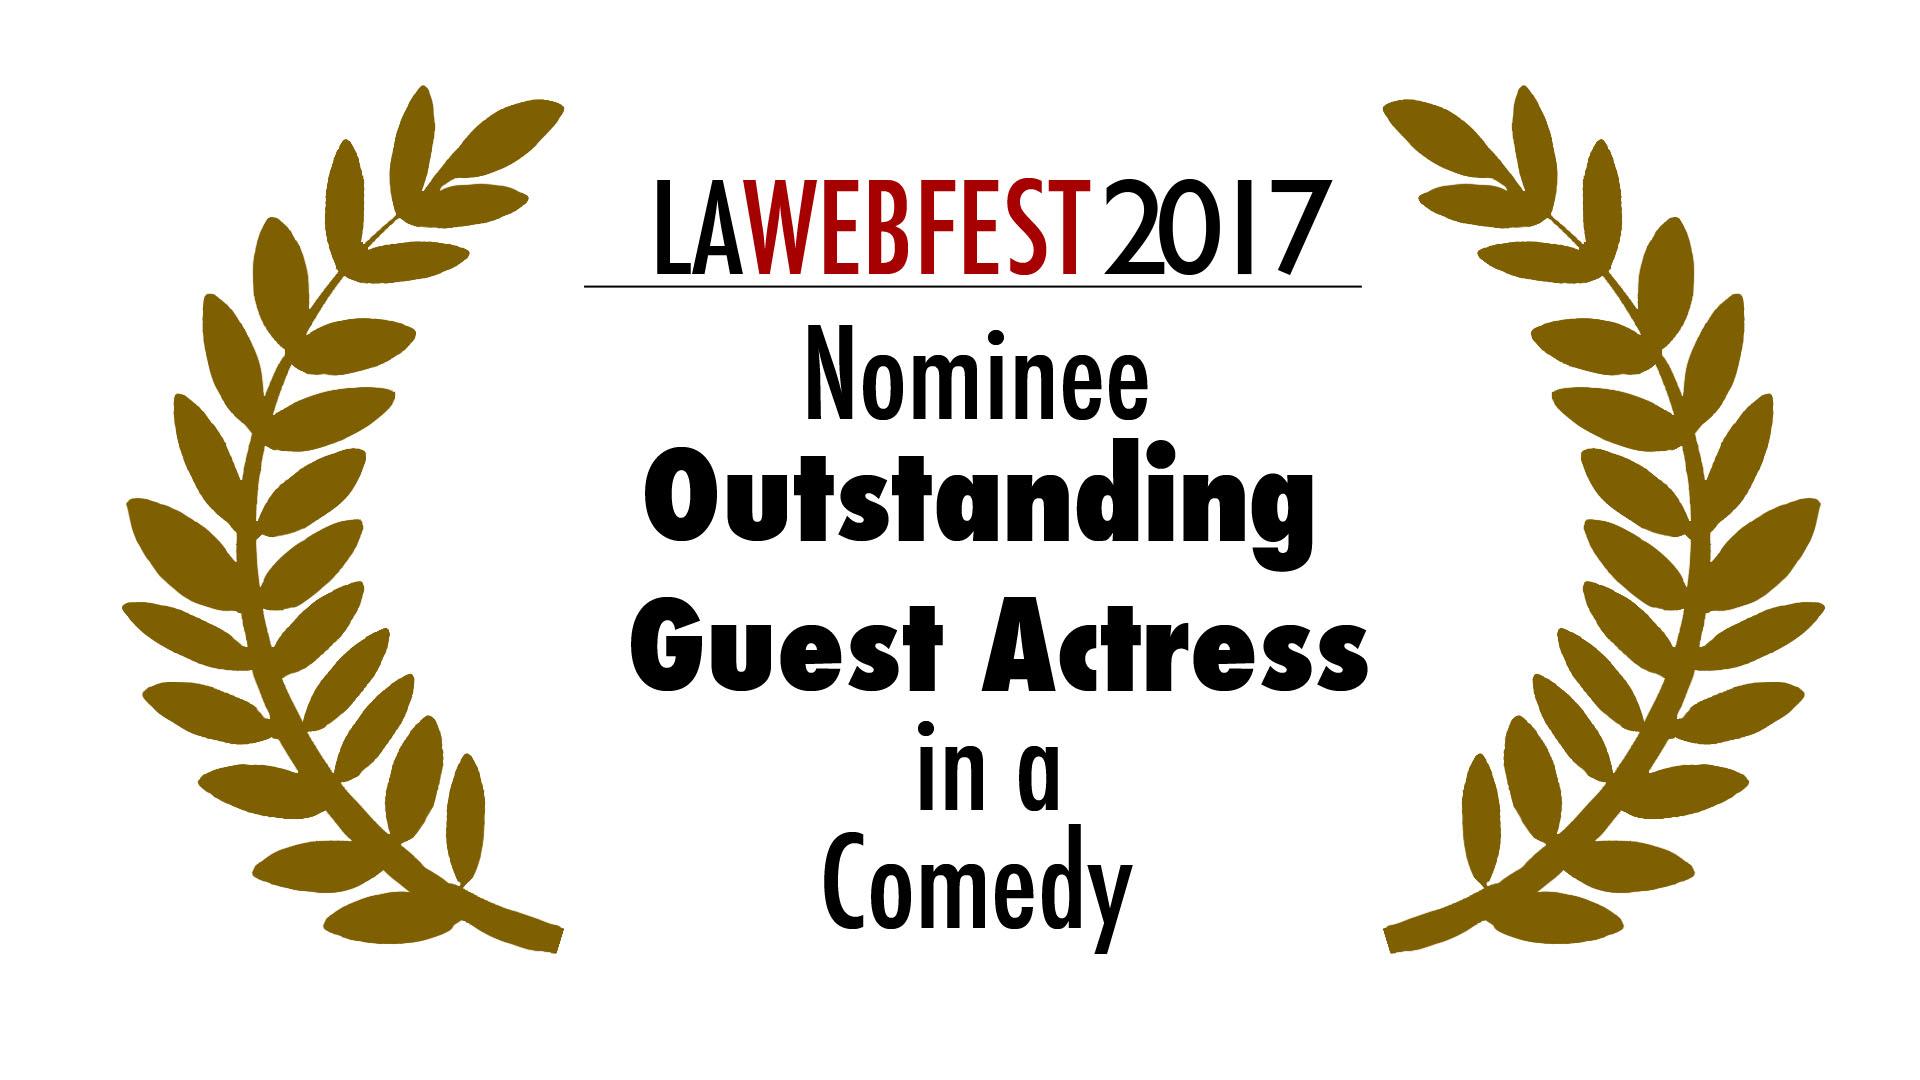 Guest Actress.COMEDY (2017) copy.jpg